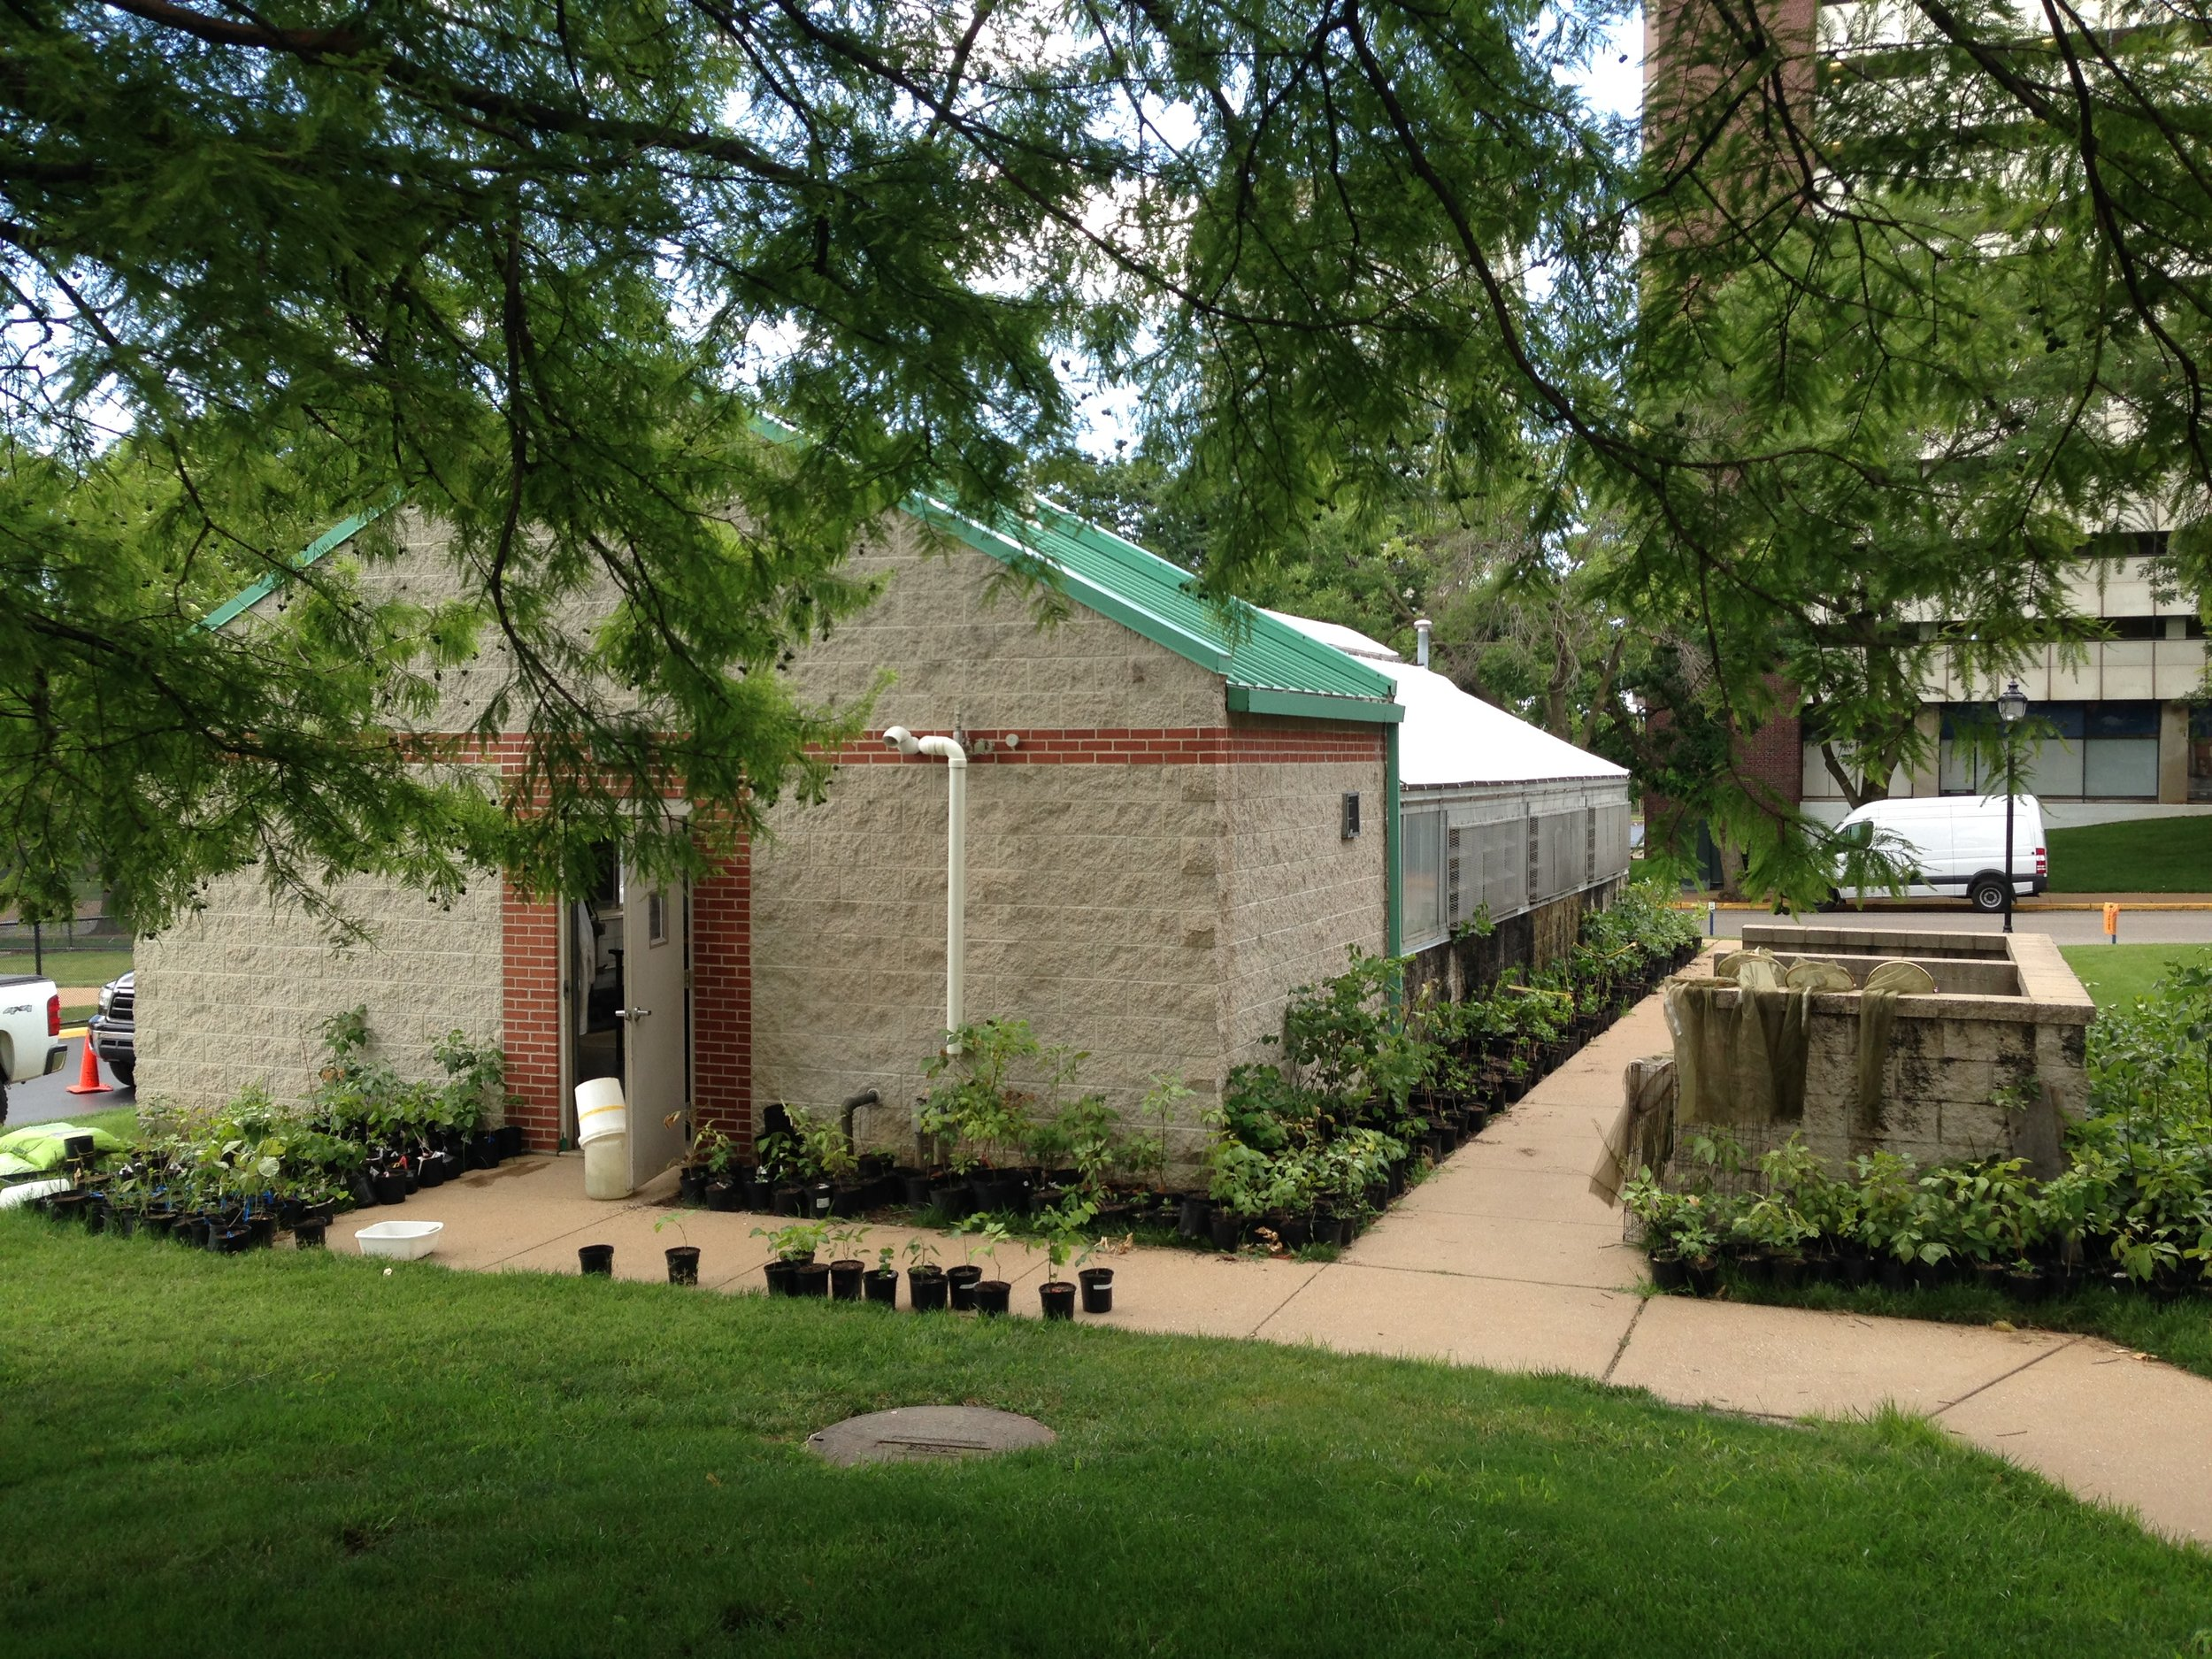 Saint Louis University's greenhouse